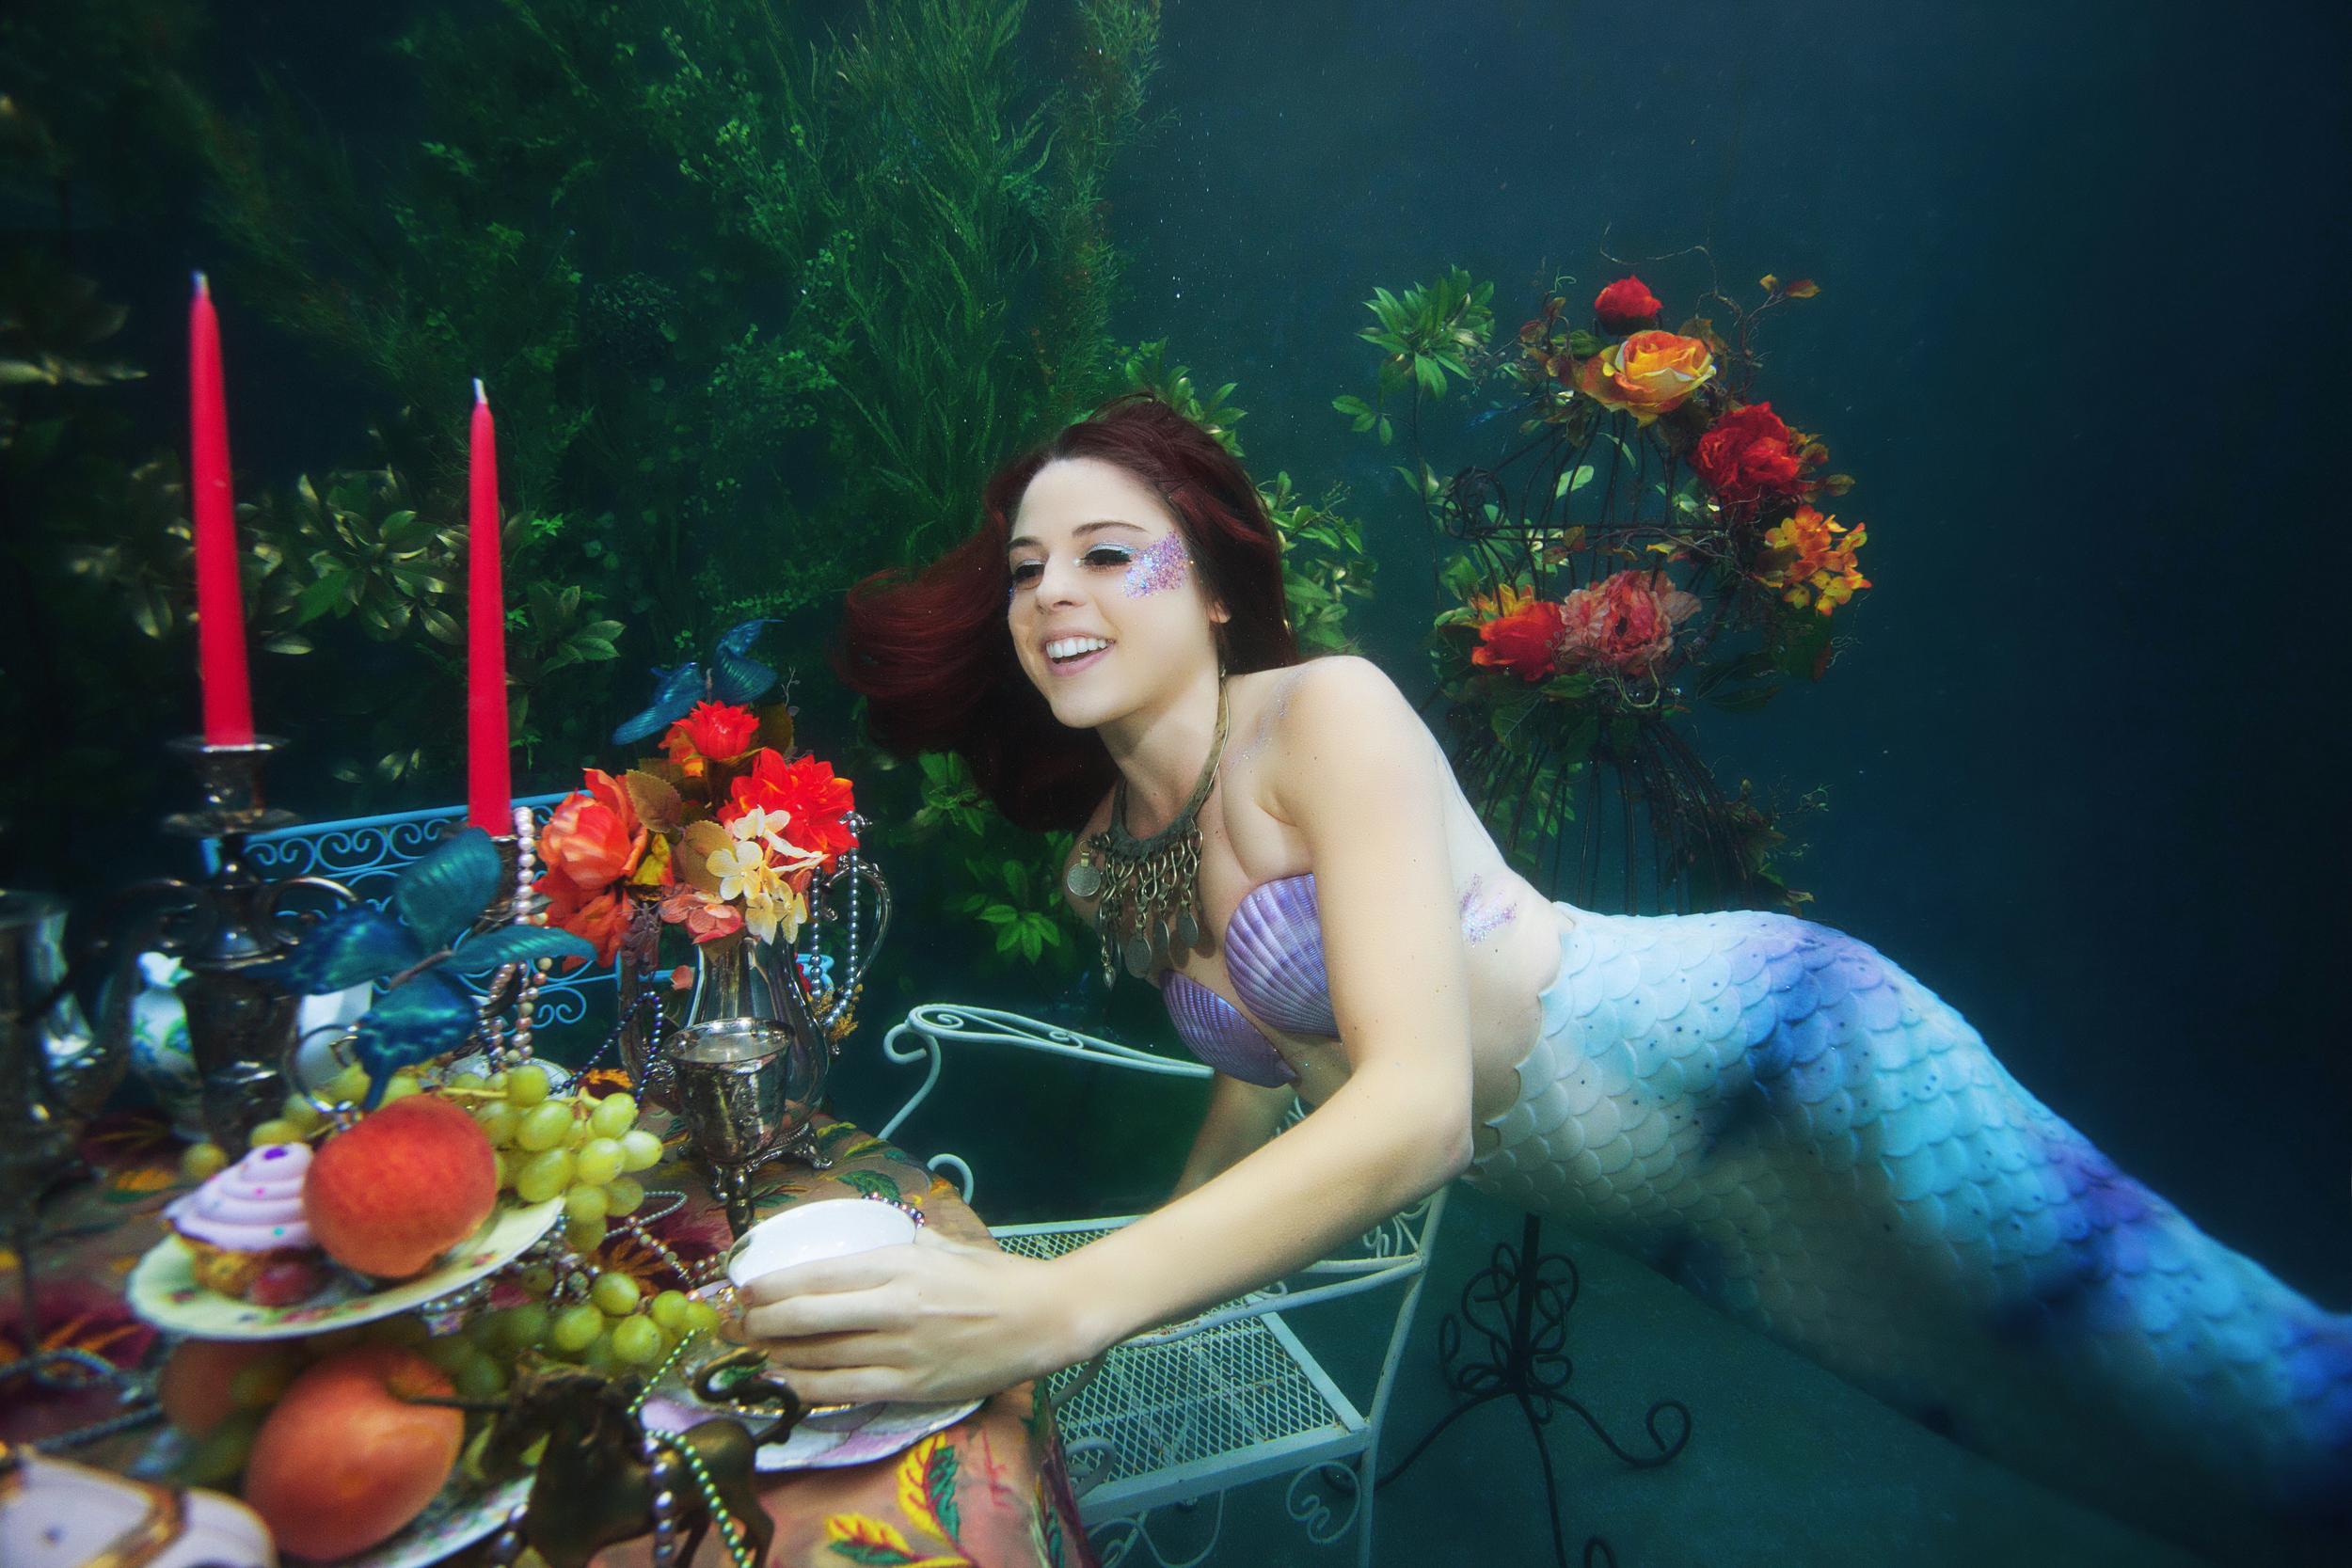 mermaidteaparty-3-(ZF-0463-12796-1-005).jpg